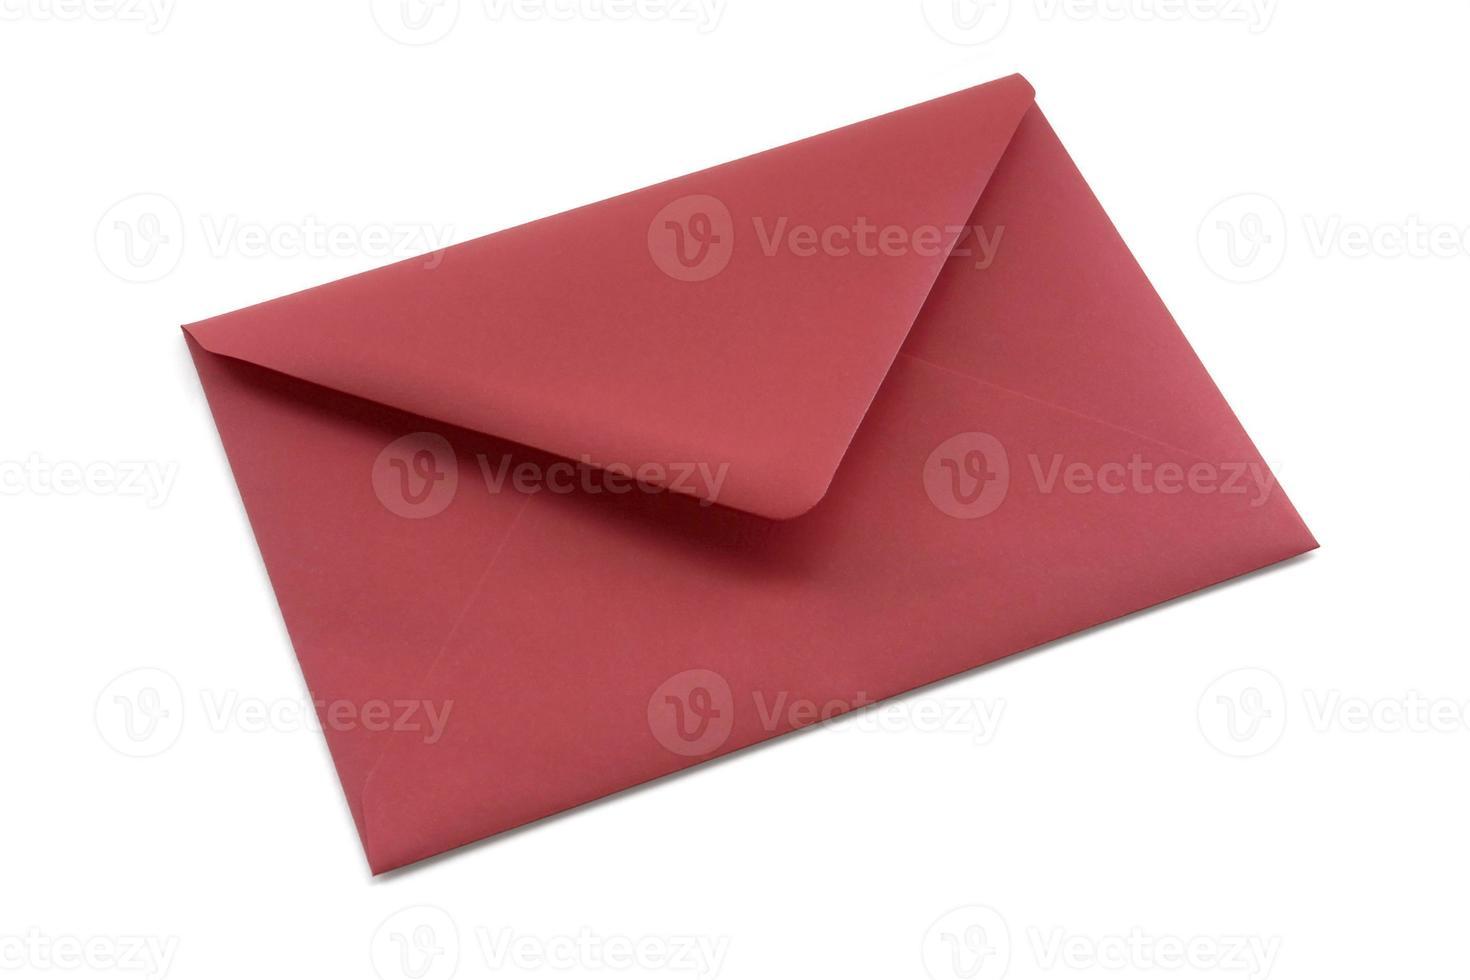 roter Umschlag foto